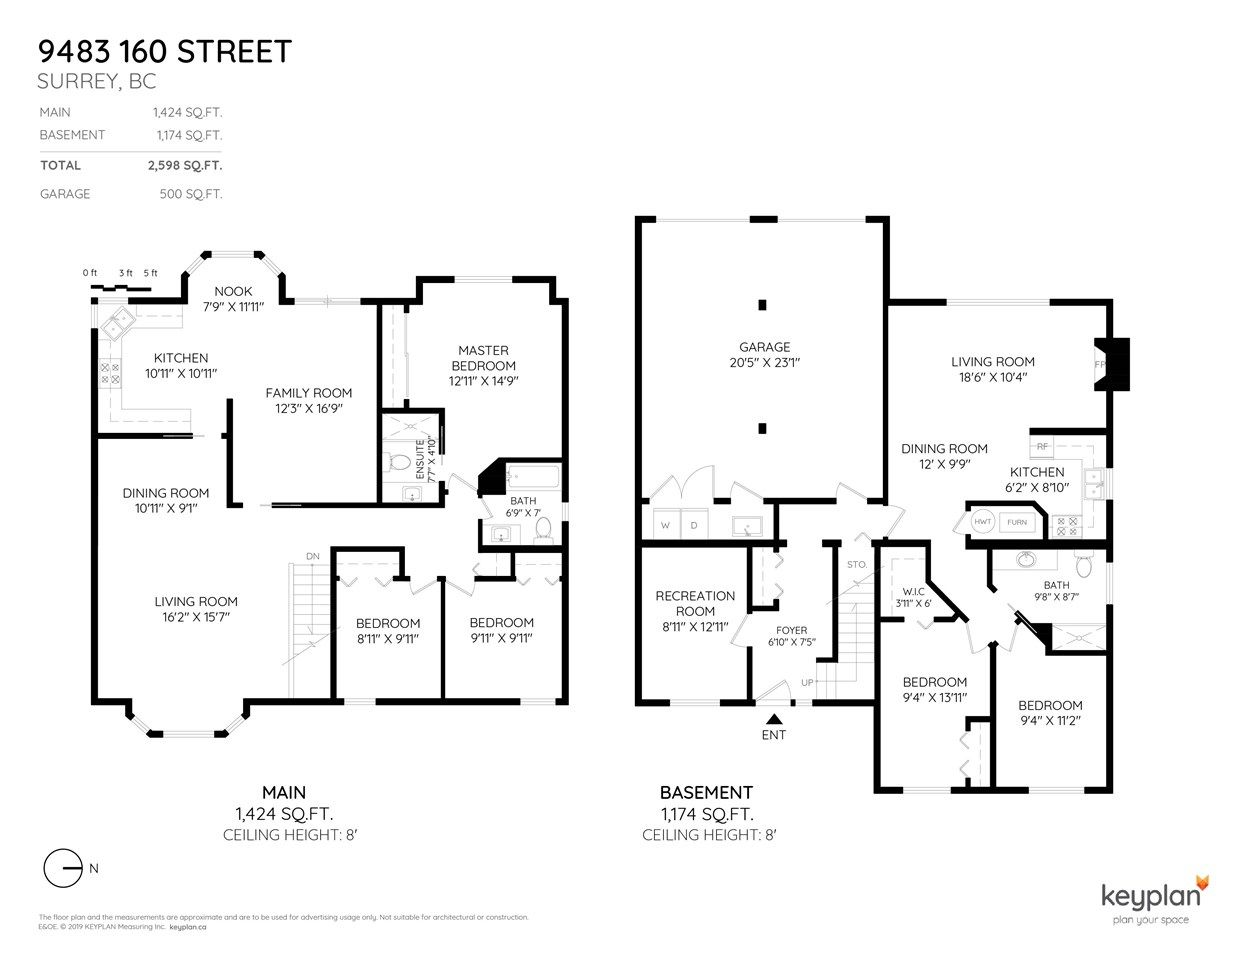 Main Photo: 9483 160 Street in Surrey: Fleetwood Tynehead House for sale : MLS®# R2358901